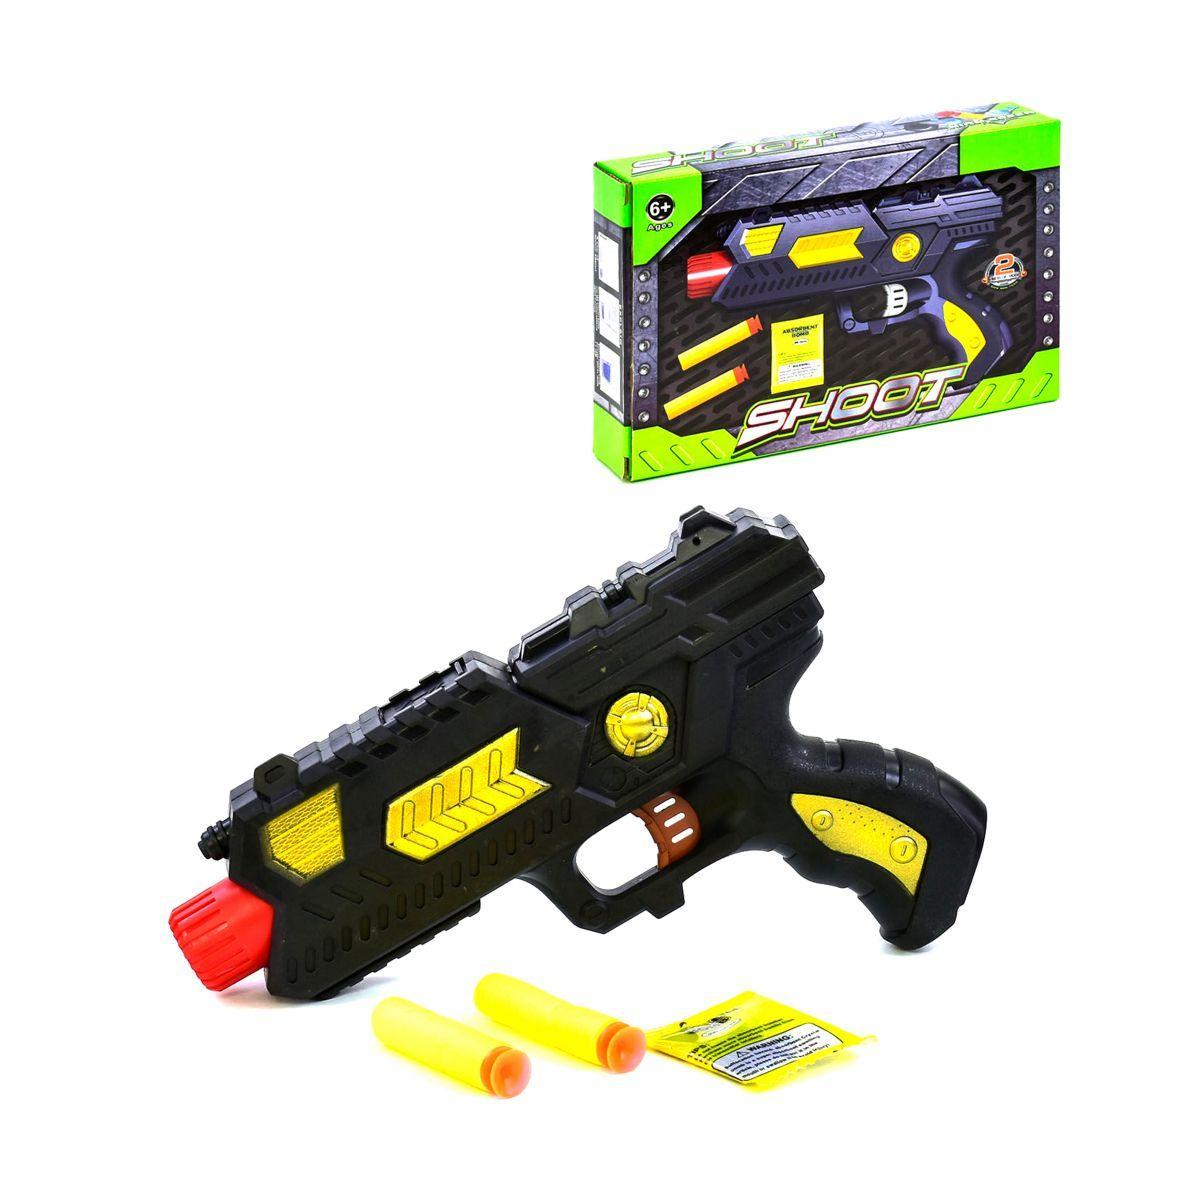 Пистолет-бластер детский